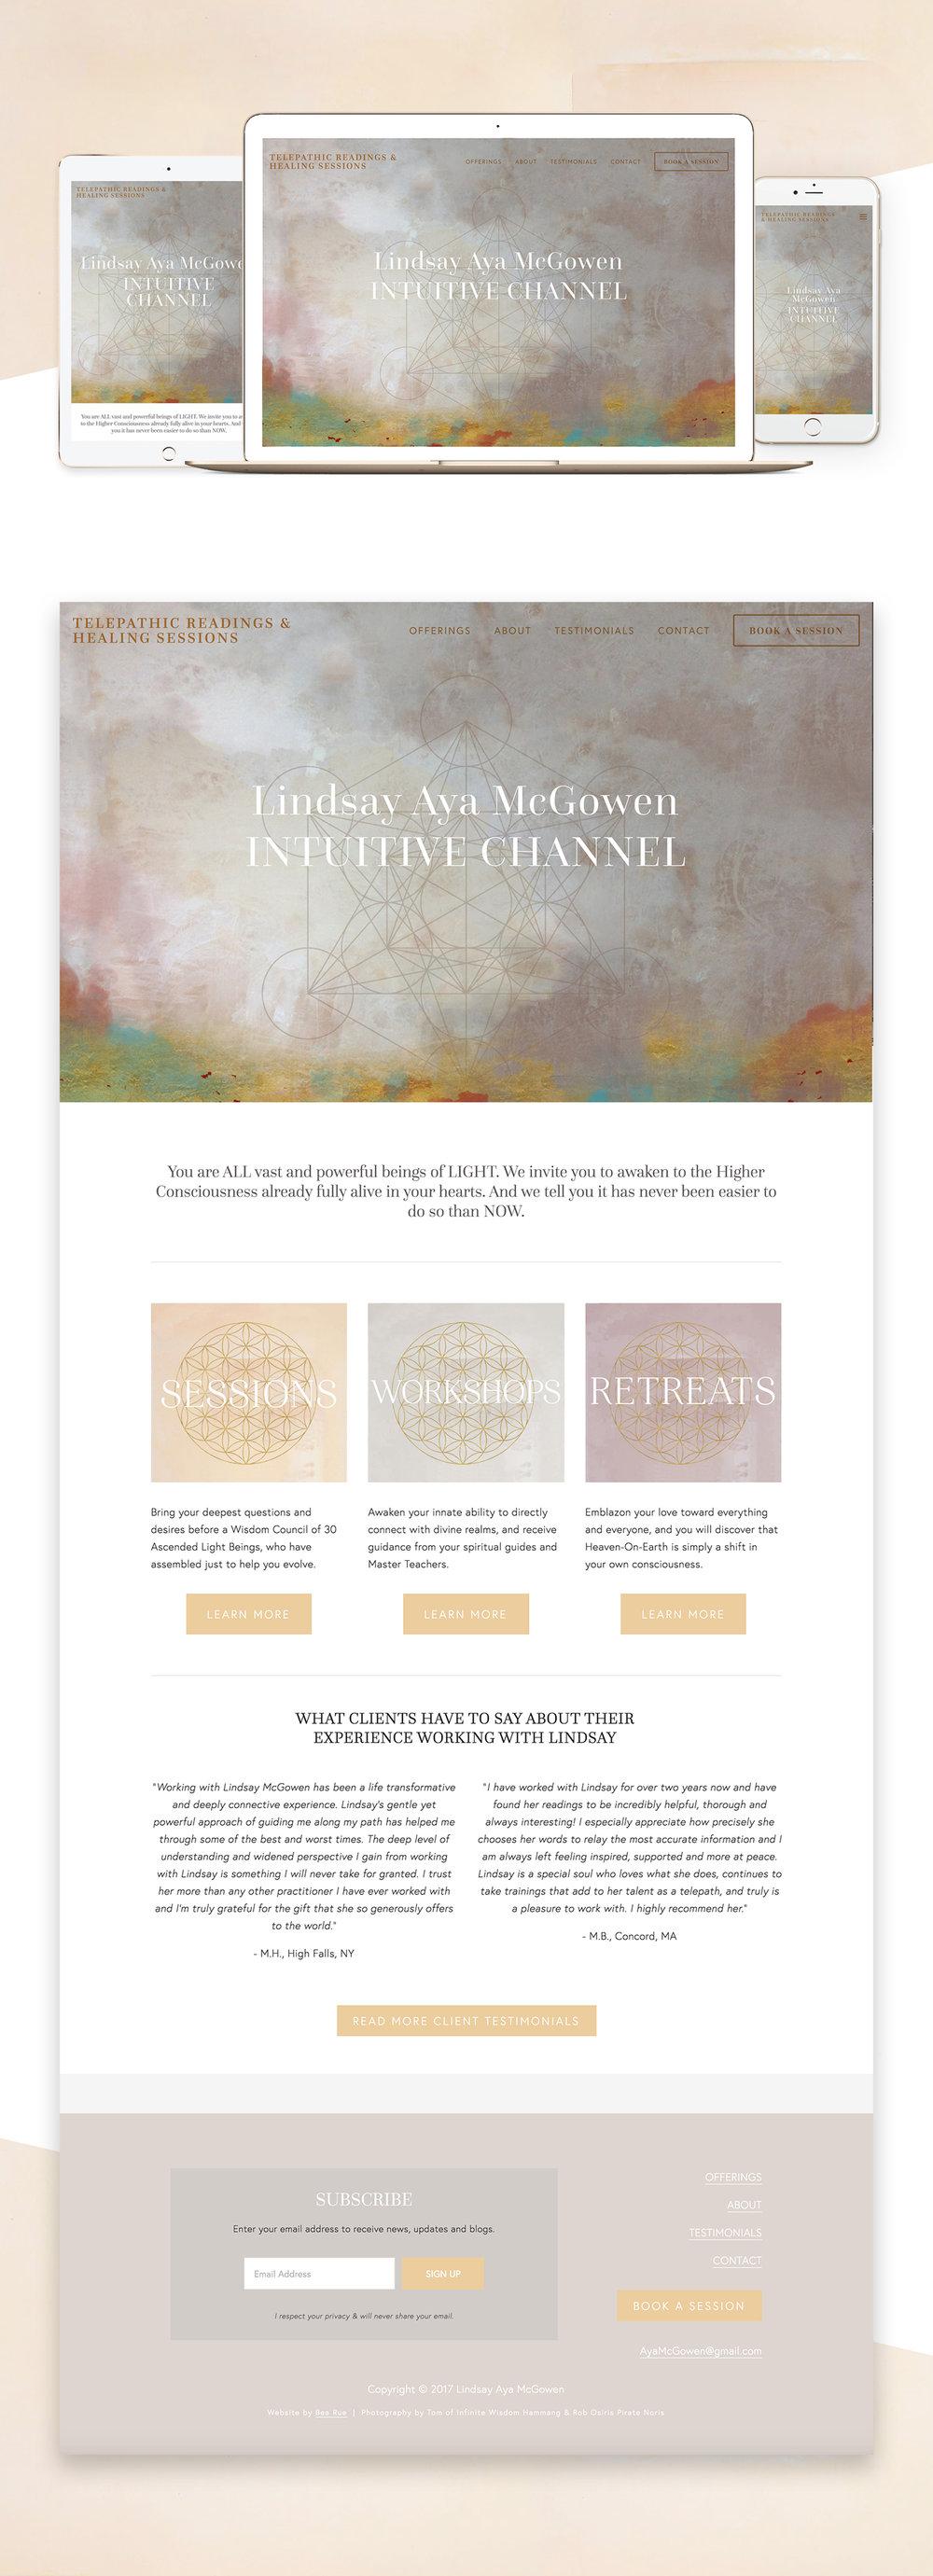 Bea Rue Hudson Valley Upstate NY Graphic Designer Branding Marketing Website Development Lindsay McGowen 2.jpg